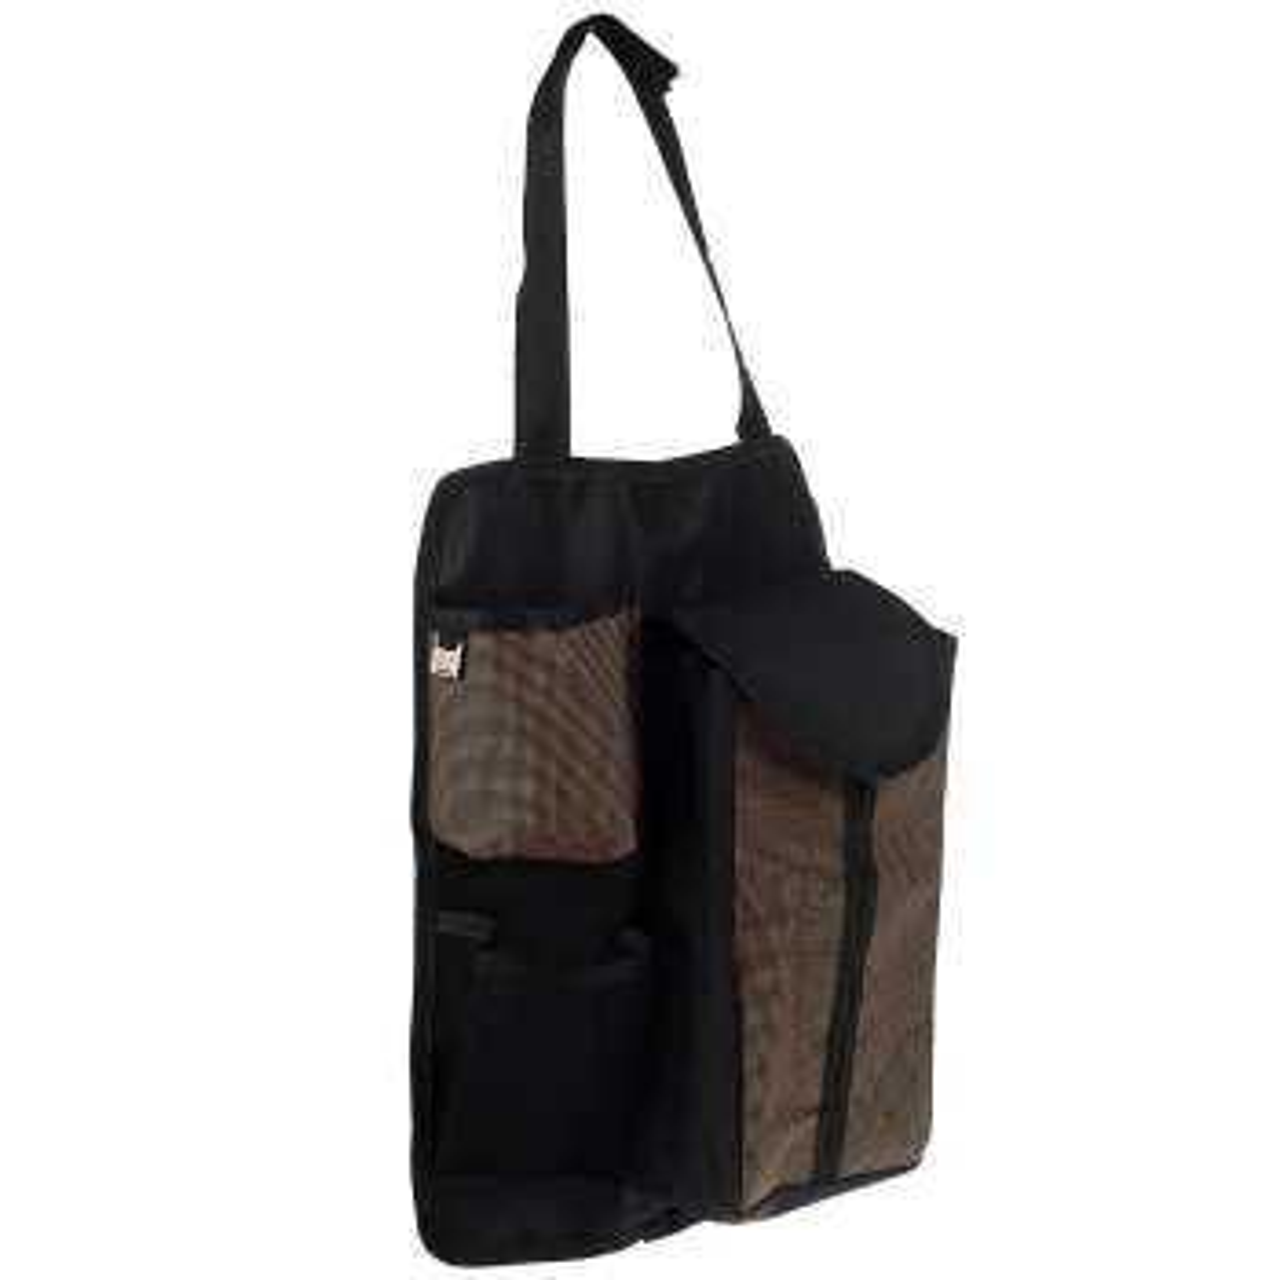 نظم دهنده دستمال کاغذی خودرو ام پی کد A15-0010 | MP Tissue Bag Seat Organizer A15-0010